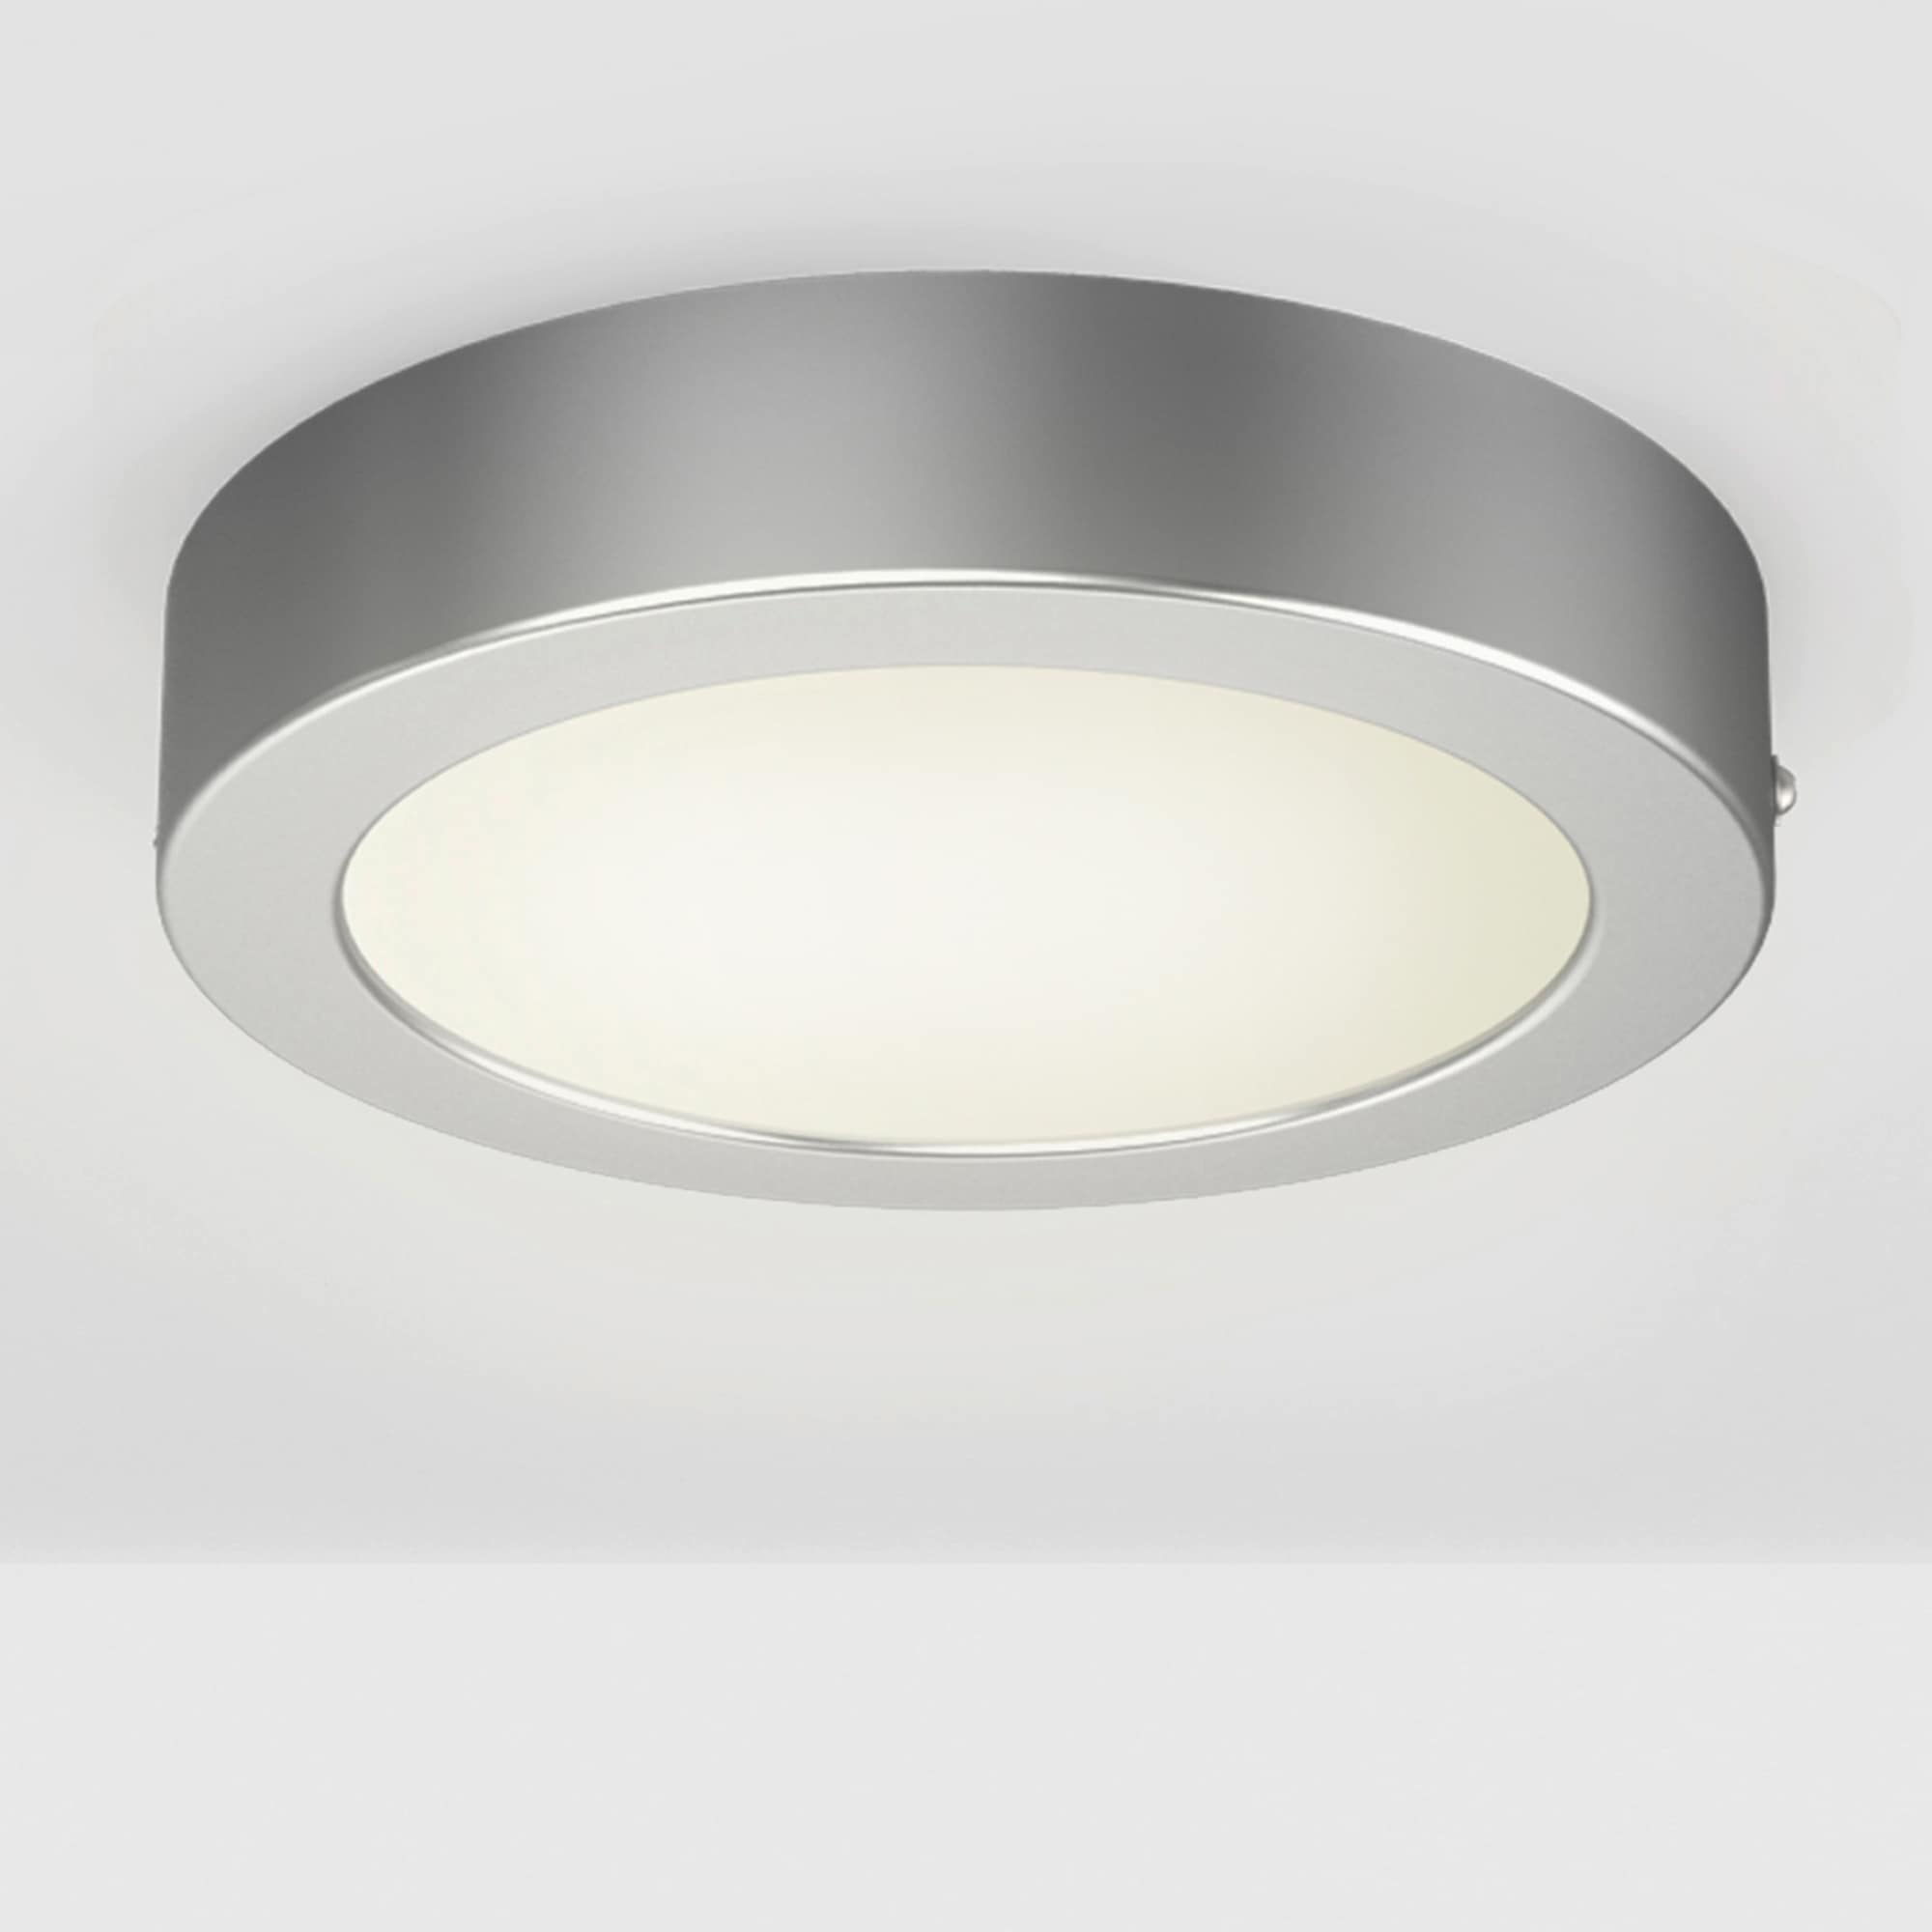 B.K.Licht LED Aufbaustrahler Garnet Grau, LED-Board, Warmweiß, LED Aufputz Deckenlampe 230V Aufbau Wand-Leuchte Panel 12W Deckenleuchte silber